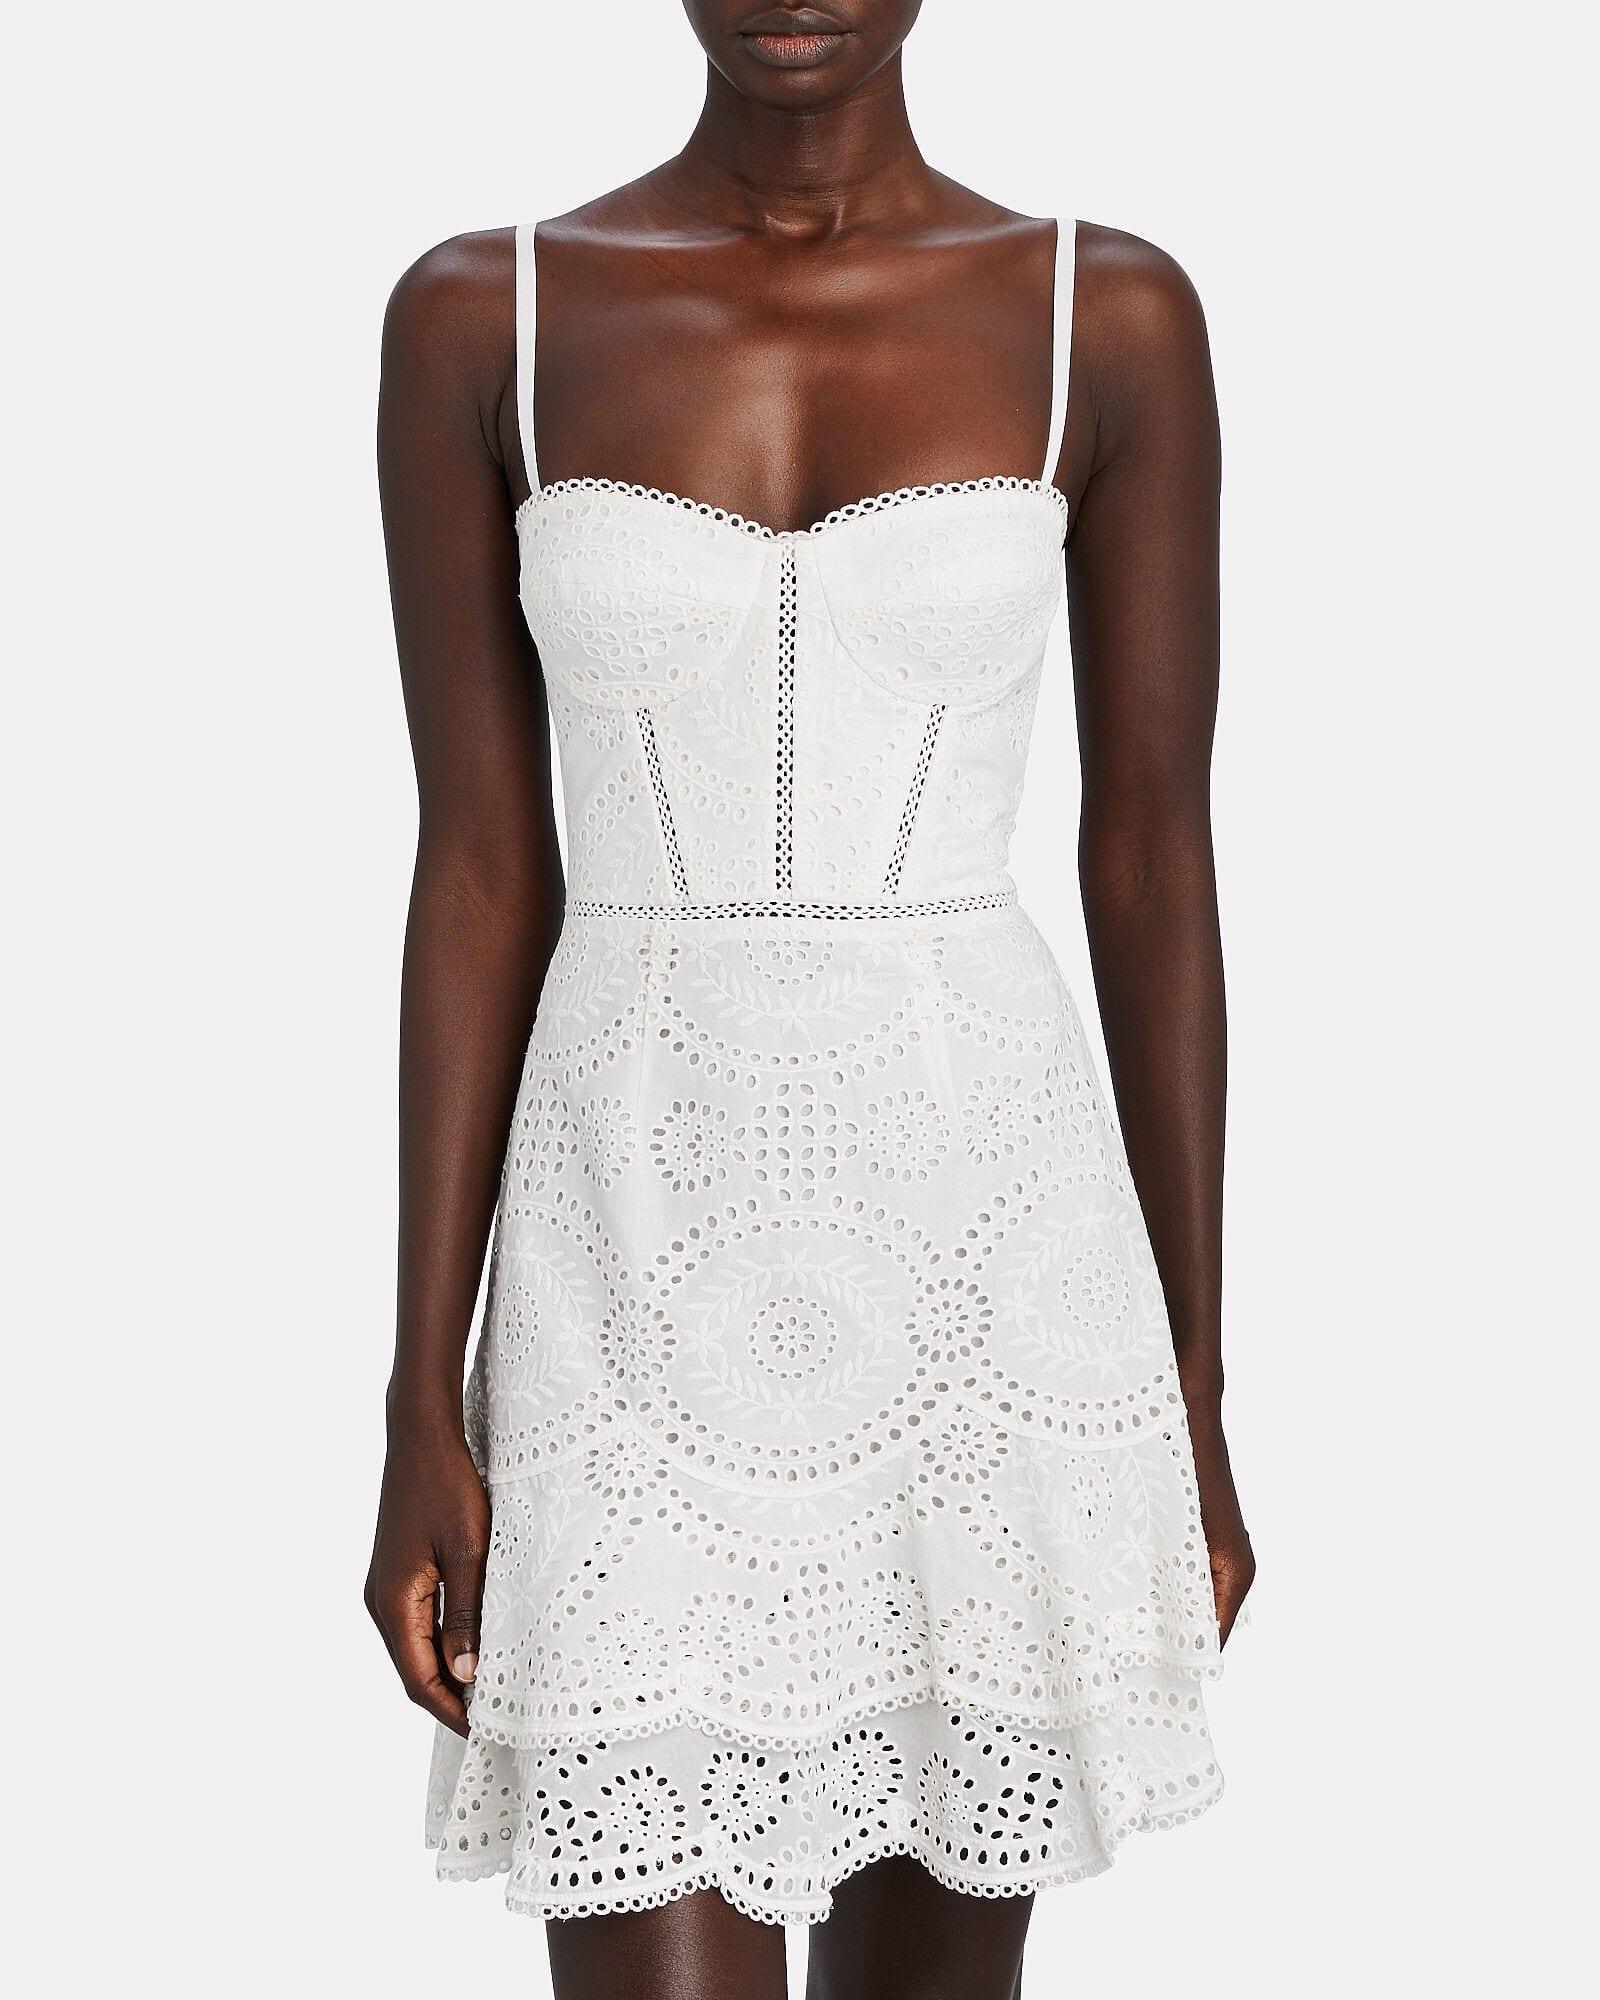 JONATHAN SIMKHAI Broderie Anglaise Bustier Mini Dress